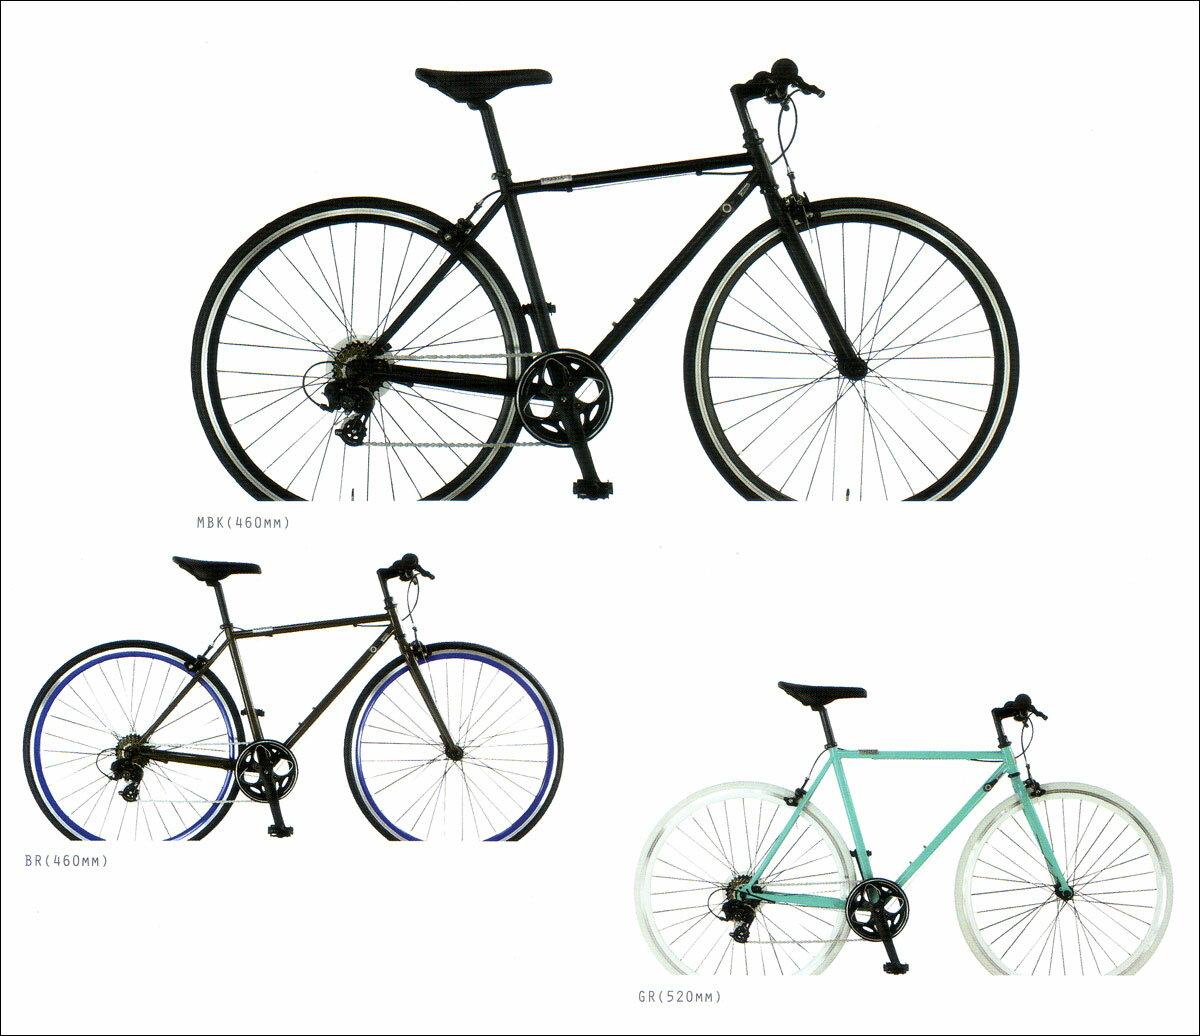 OSSO(オッソ) R310-CR【クロスバイク】【運動/健康/美容】 OSSO(オッソ) R310-CR【クロスバイク】